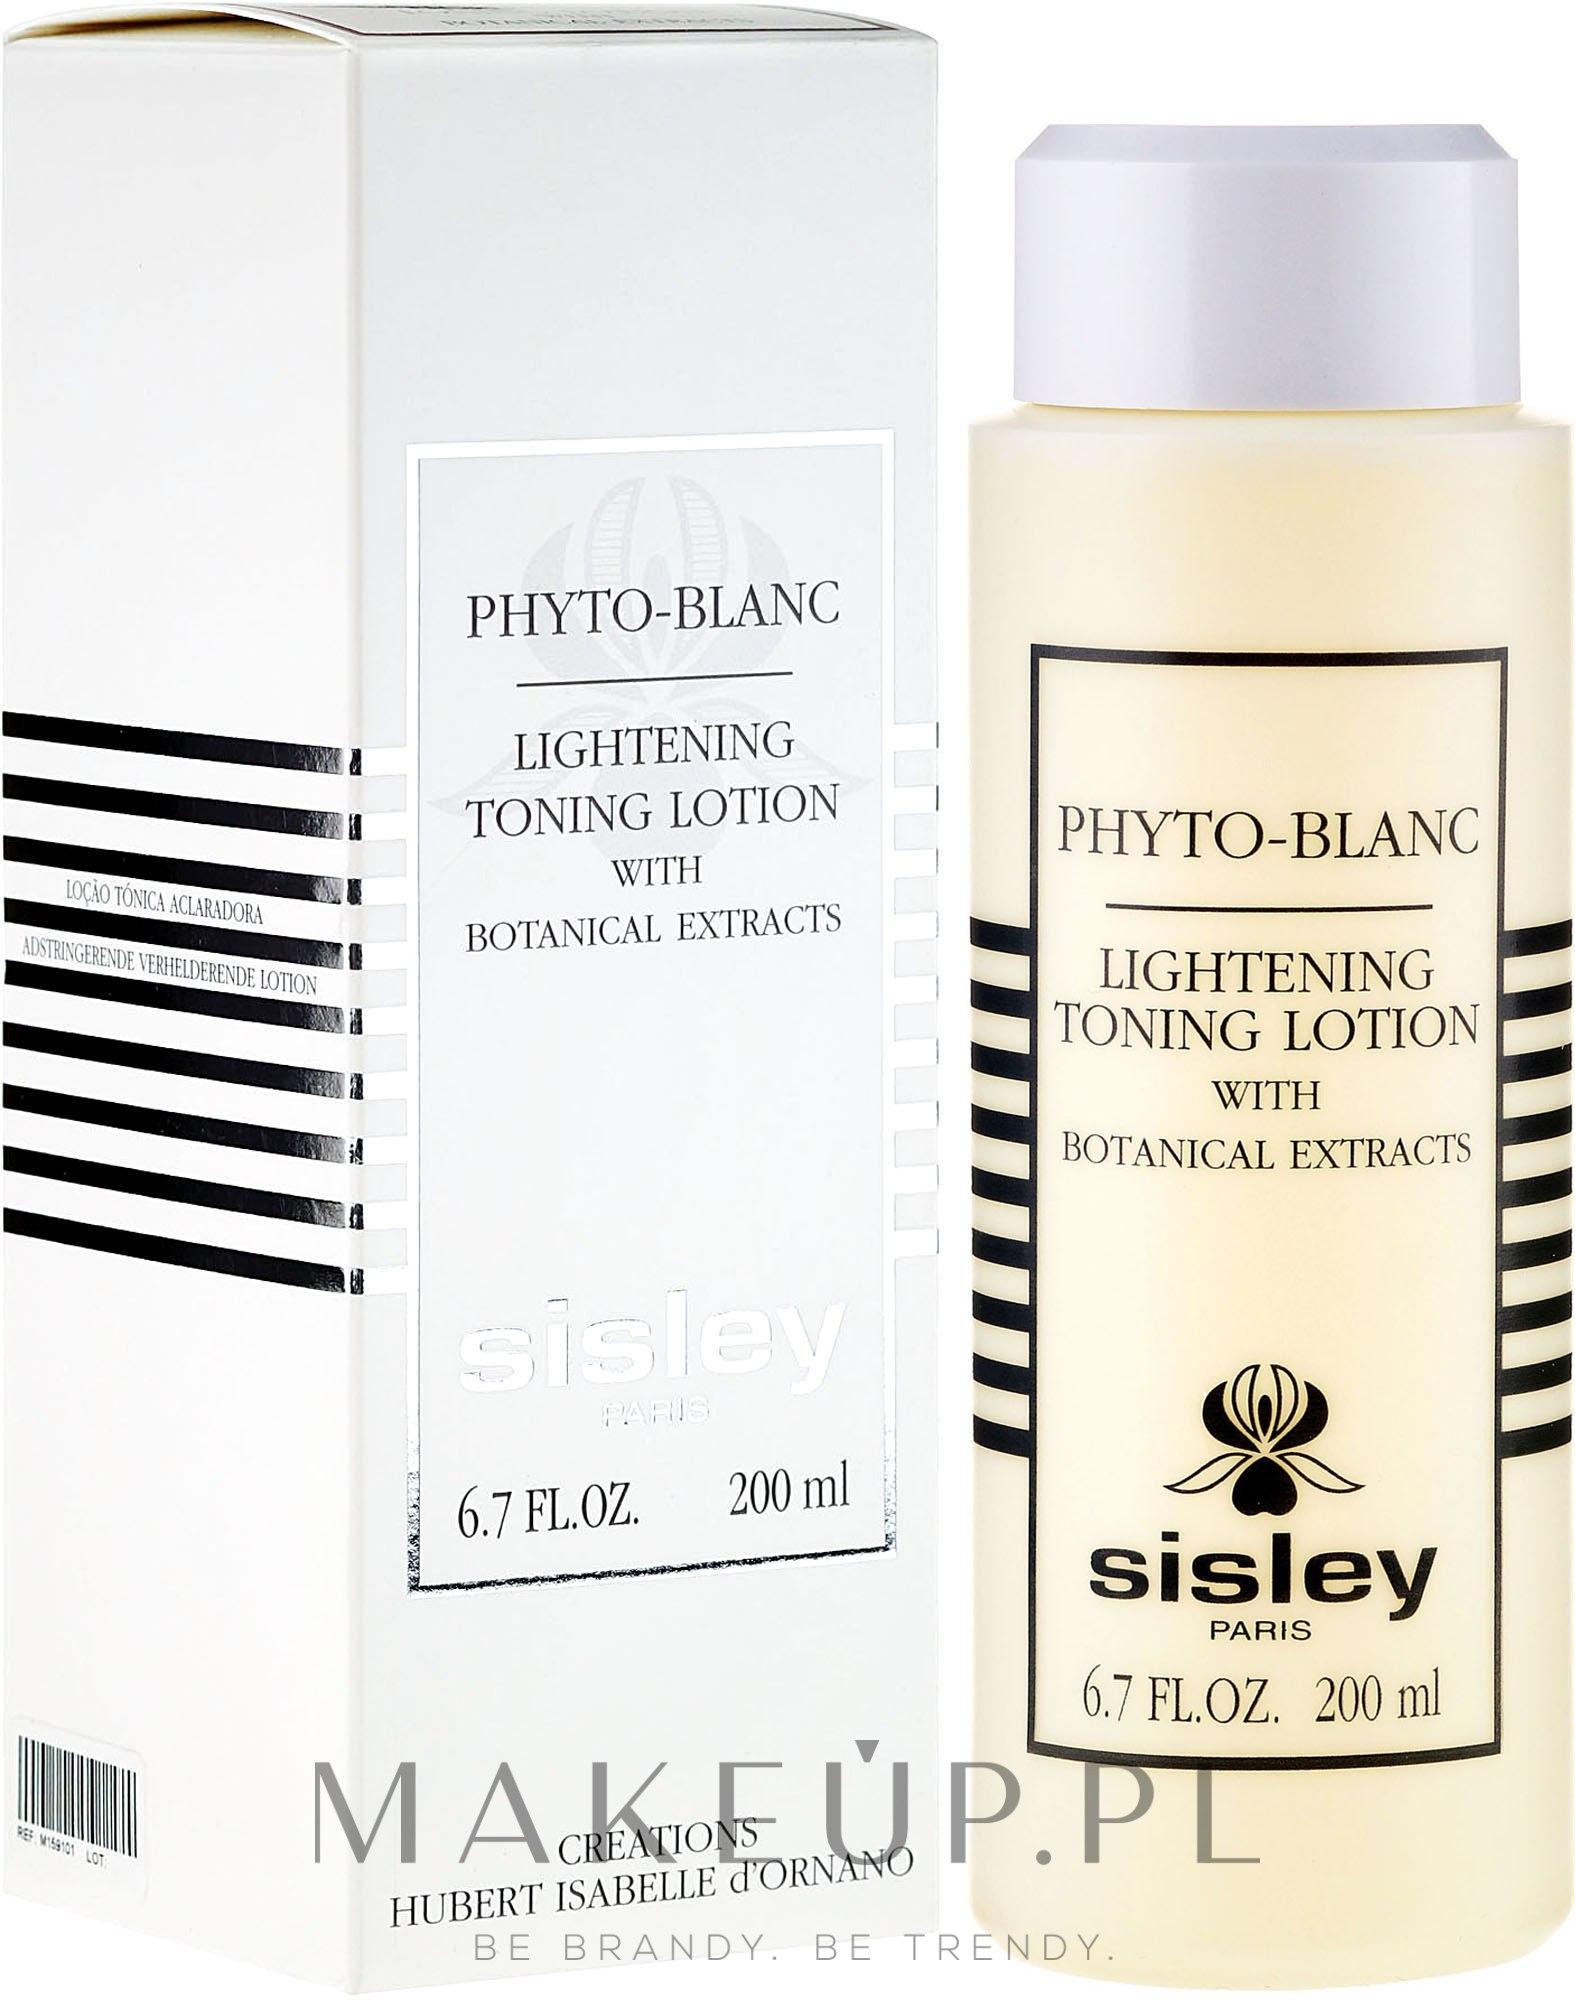 Płyn tonizujący z roślinnymi ekstraktami - Sisley Phyto-Blanc Lightening Toning Lotion — фото 200 ml